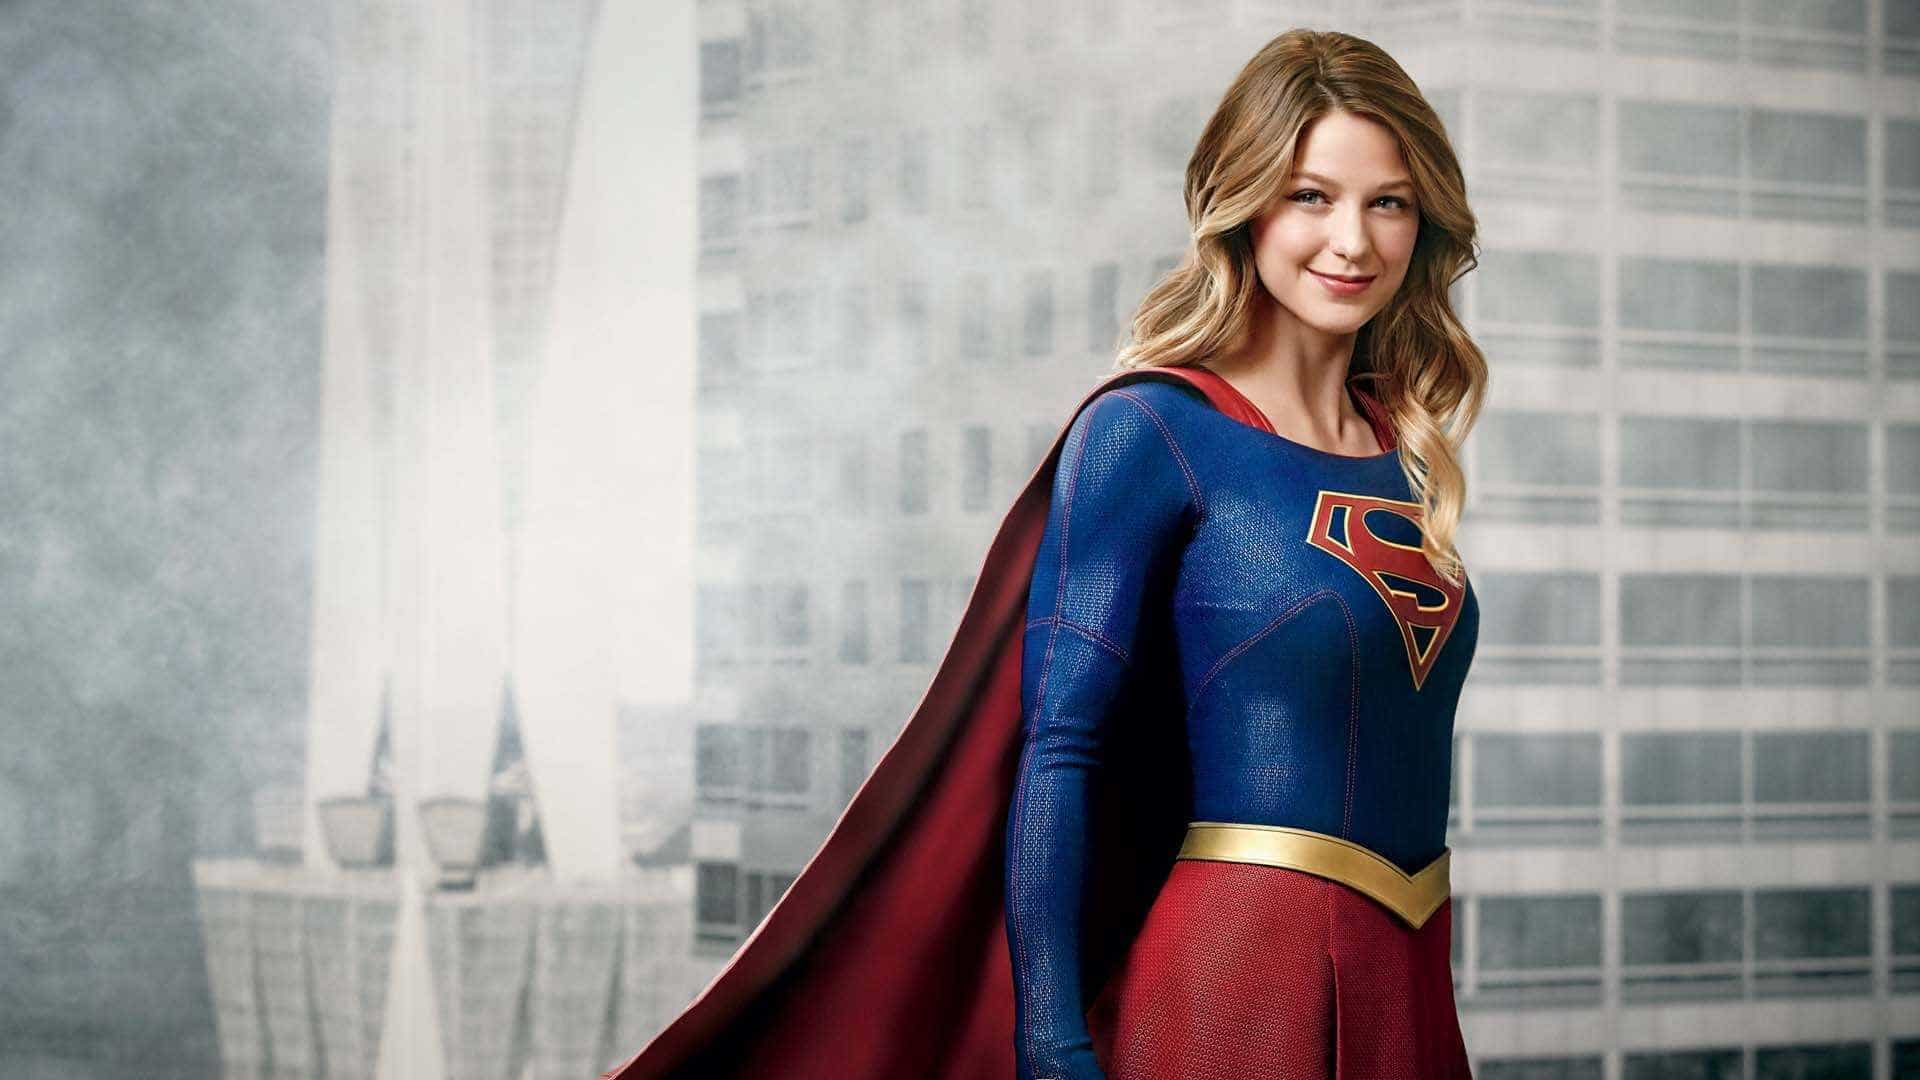 'Supergirl' terá heroína transgênero em nova temporada